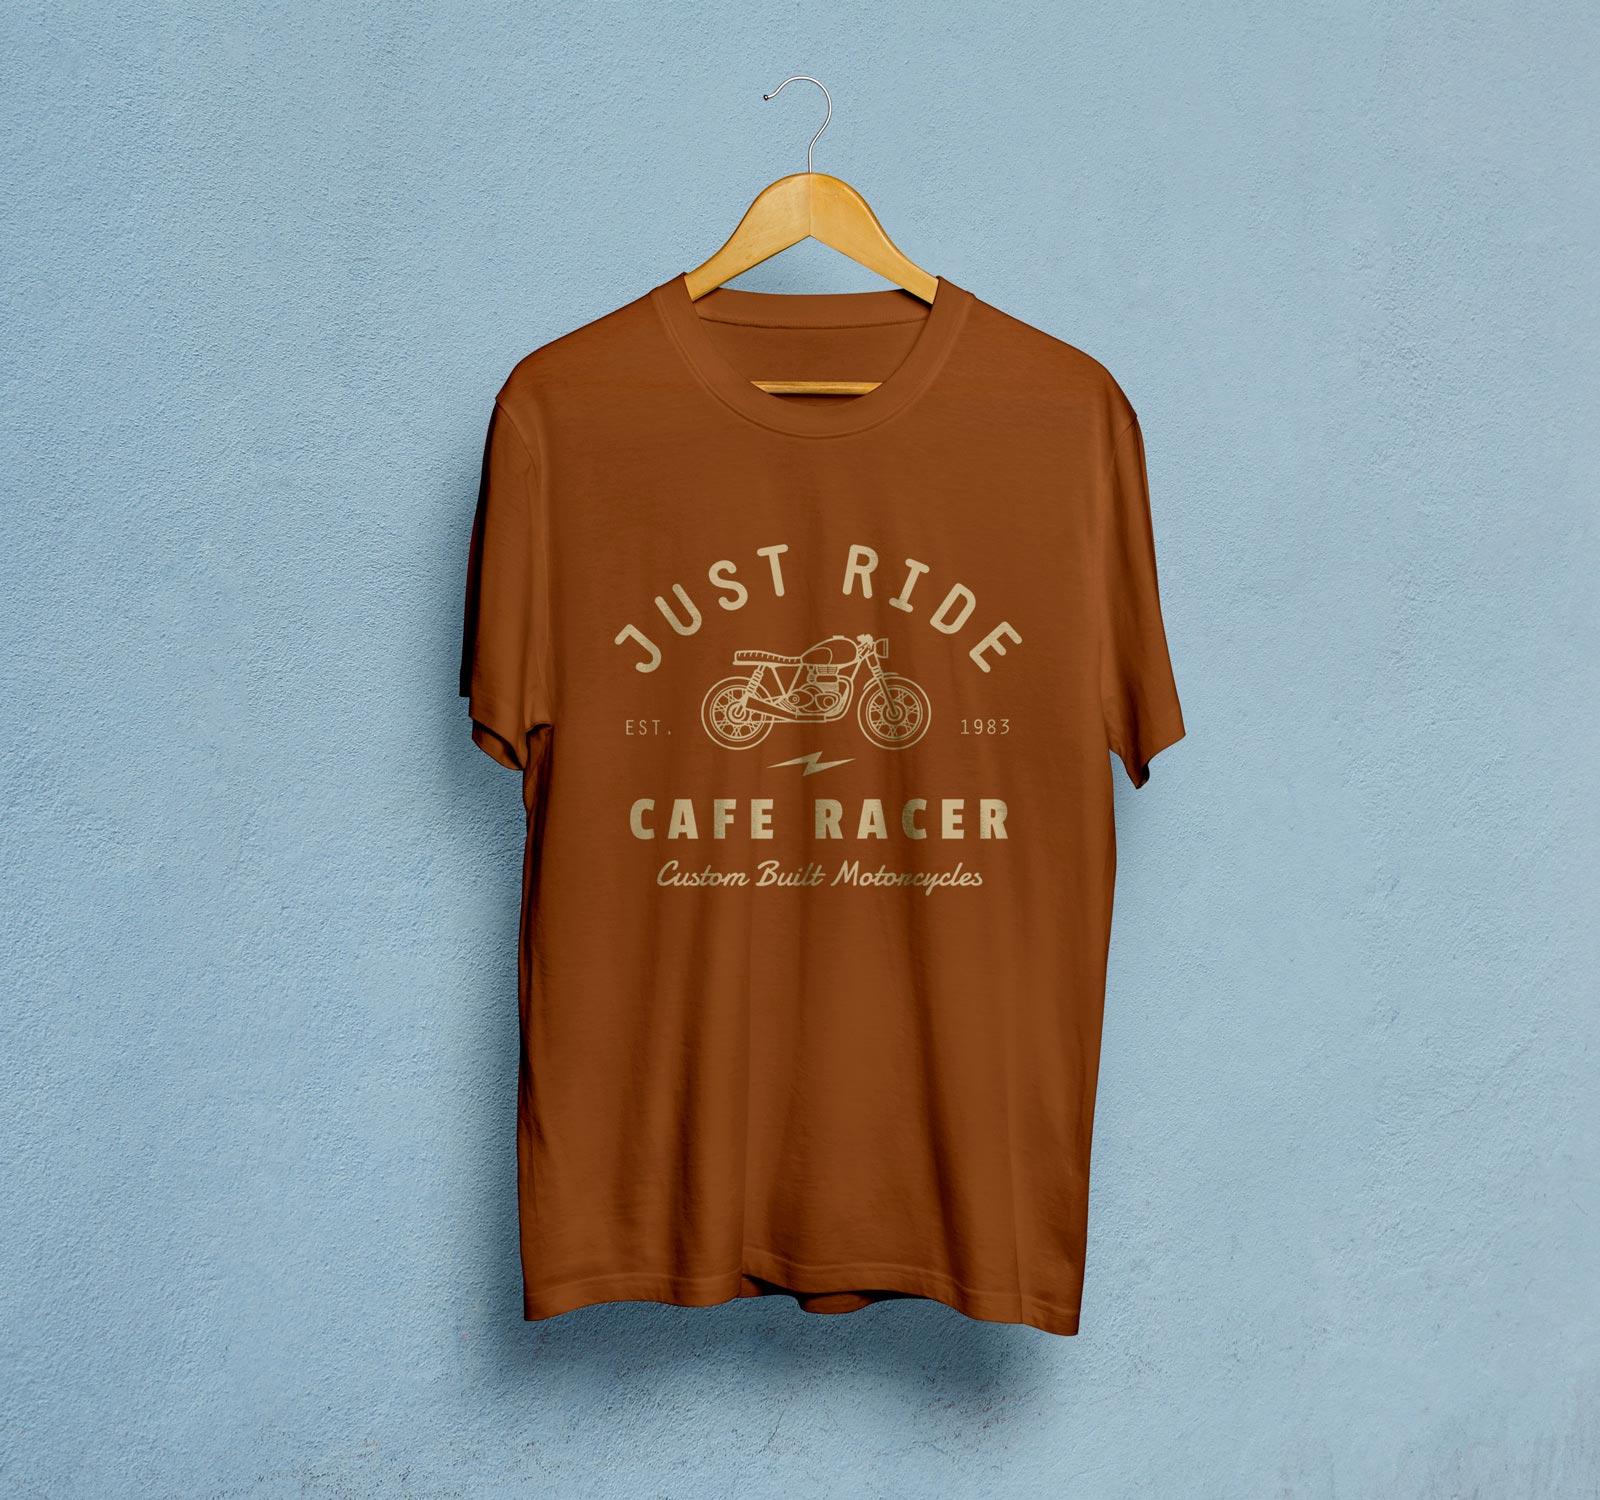 Free-Brown-Half-Sleeves-T-Shirt-Mockup-PSD-File